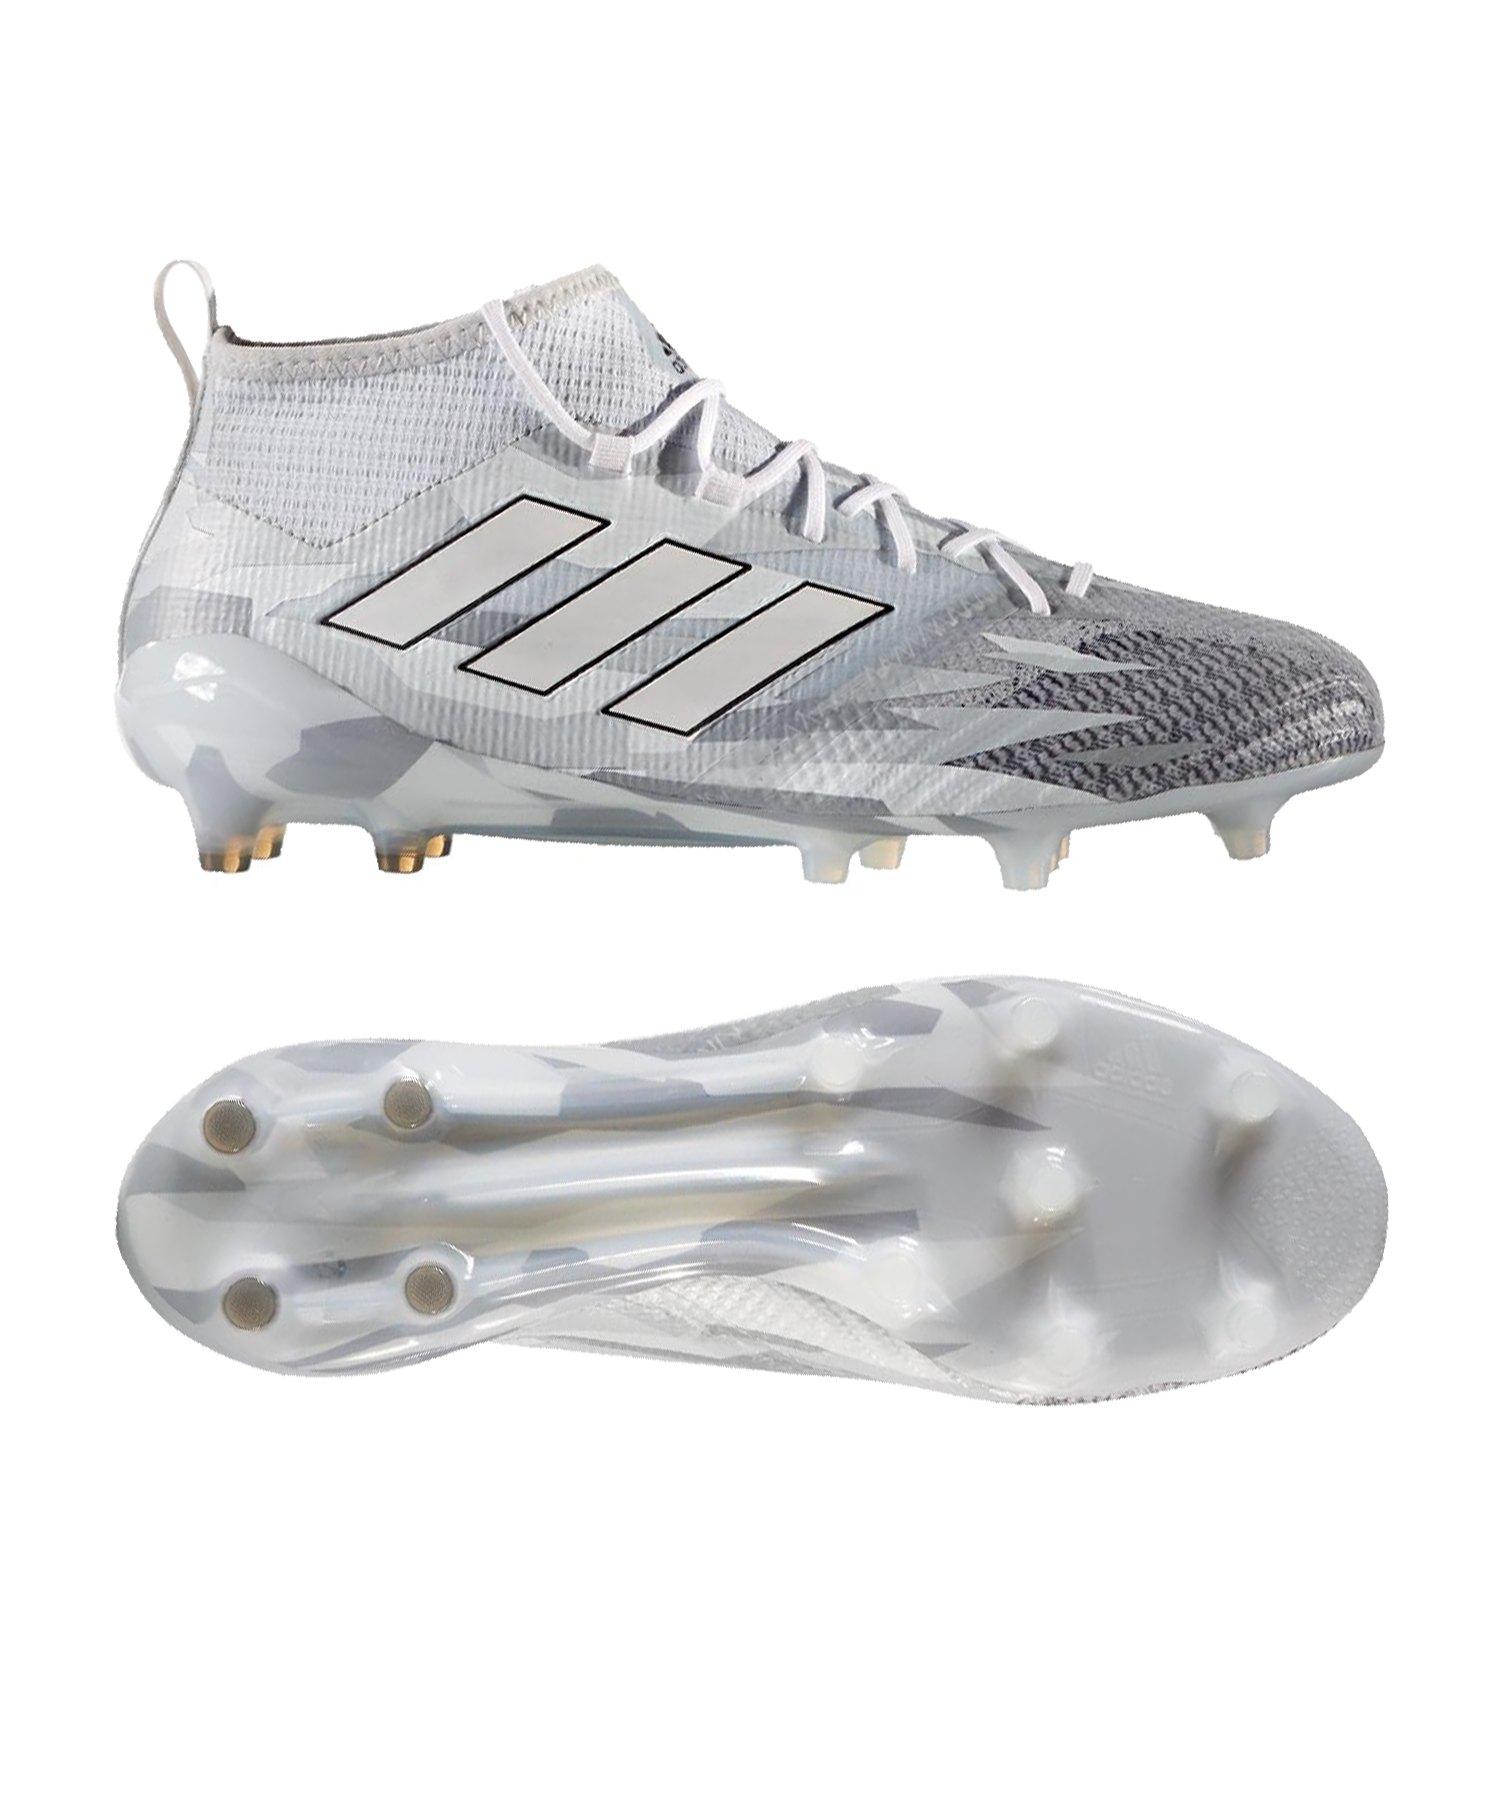 Adidas Ace 17.1 Primeknit FG Grau Weiss   Trends Sport